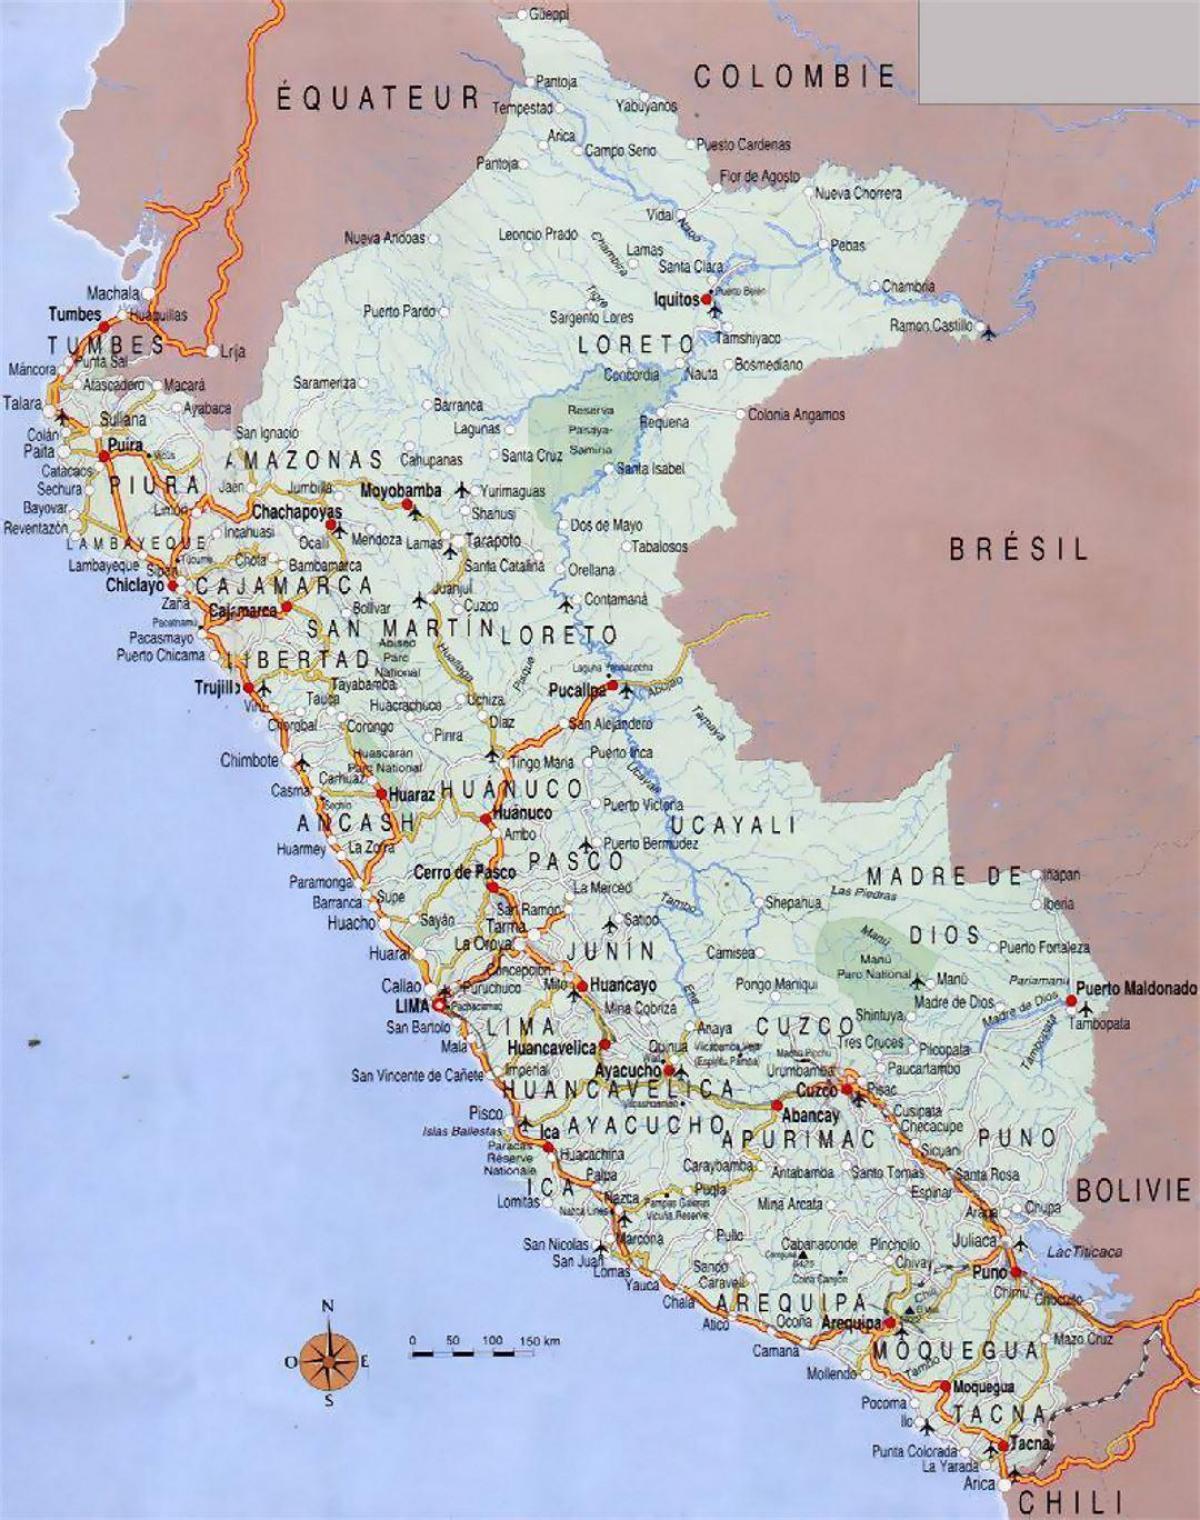 Peru Byer Kort Kort Over Peru Byer Syd Amerika Amerika